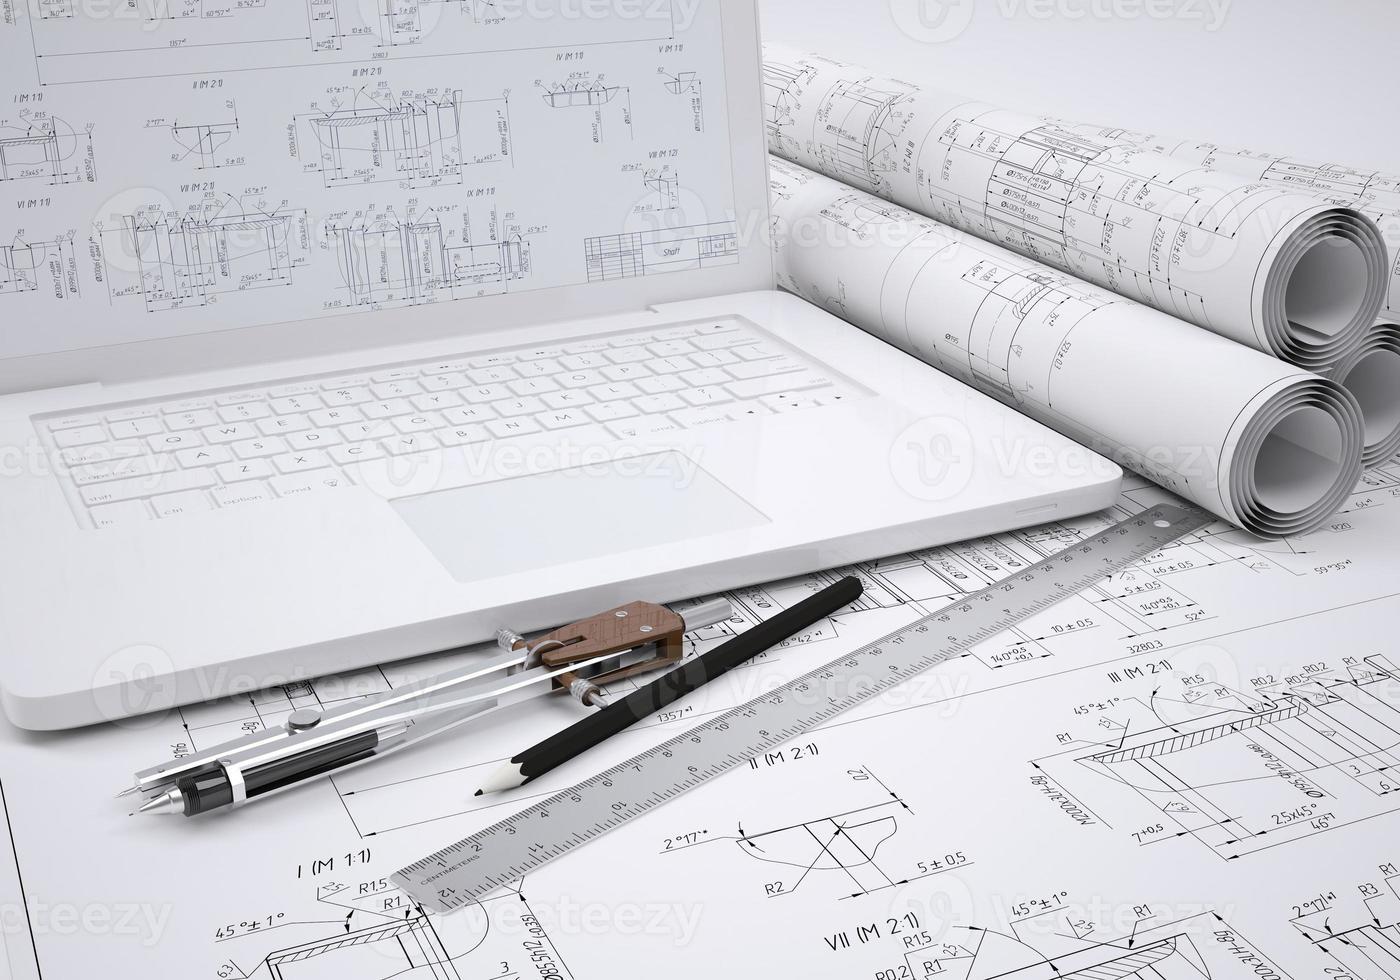 scorre disegni tecnici e laptop foto